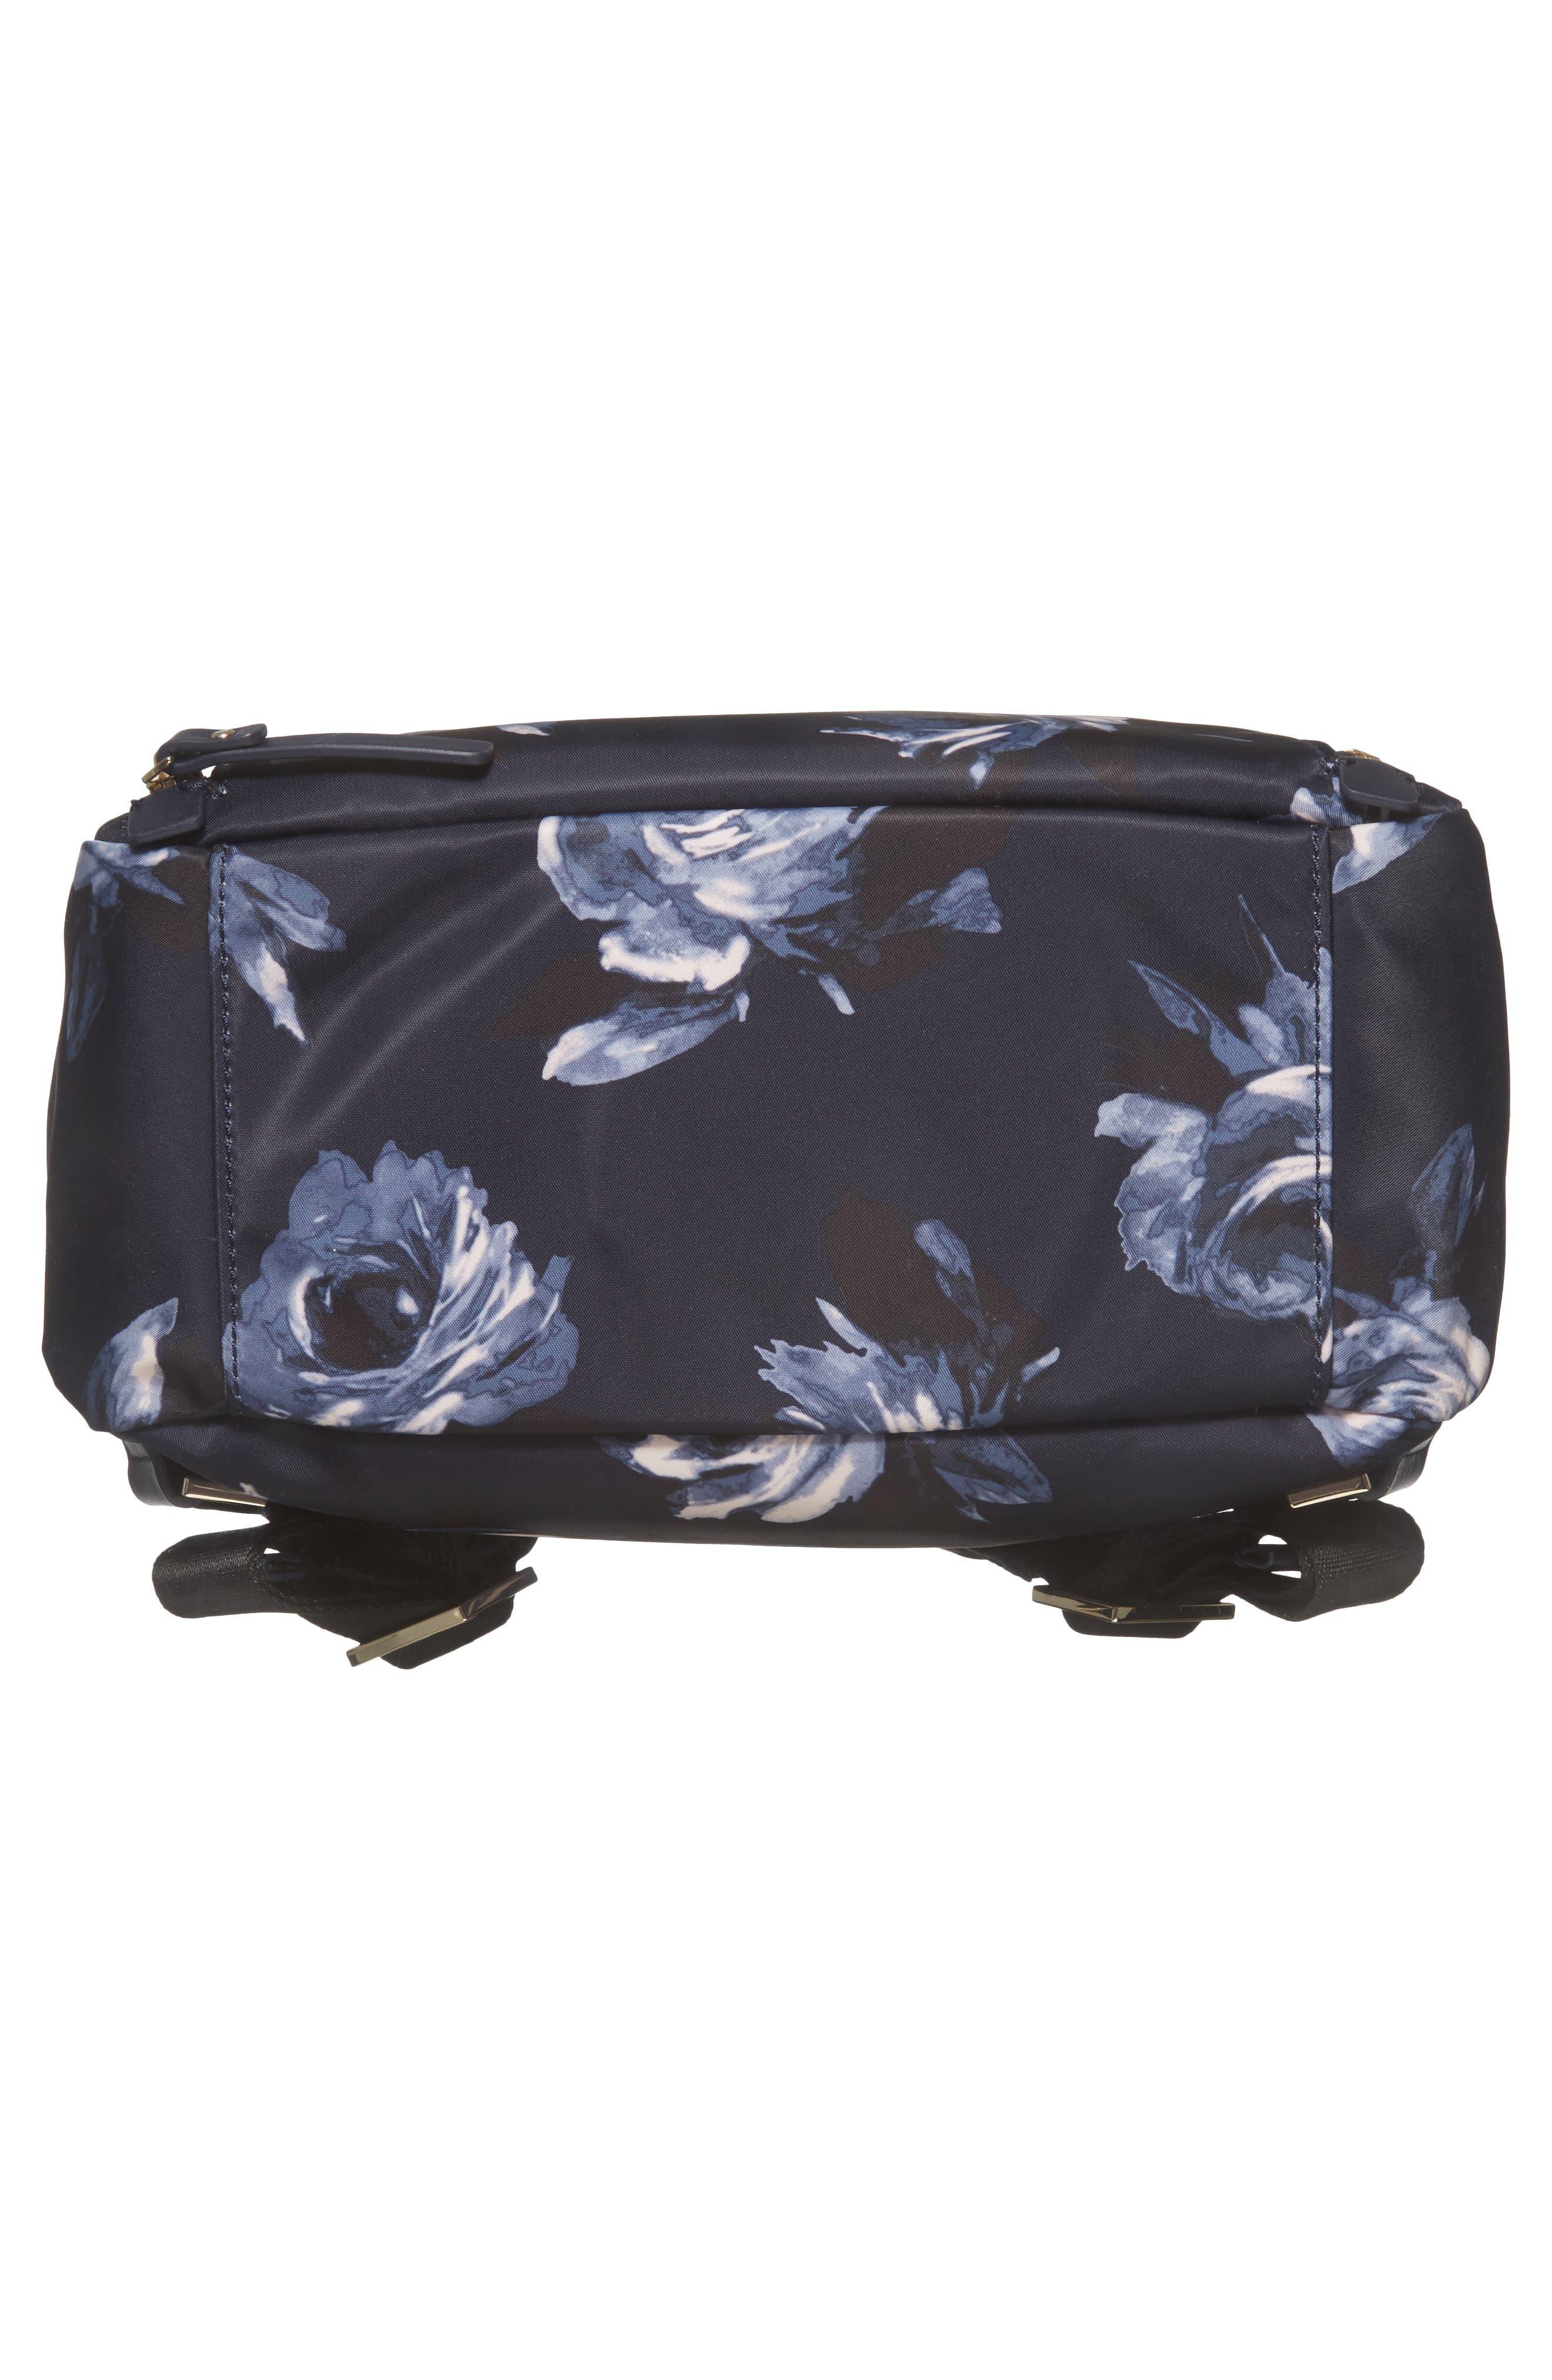 watson lane night rose hartley nylon backpack,                             Alternate thumbnail 6, color,                             Night Rose